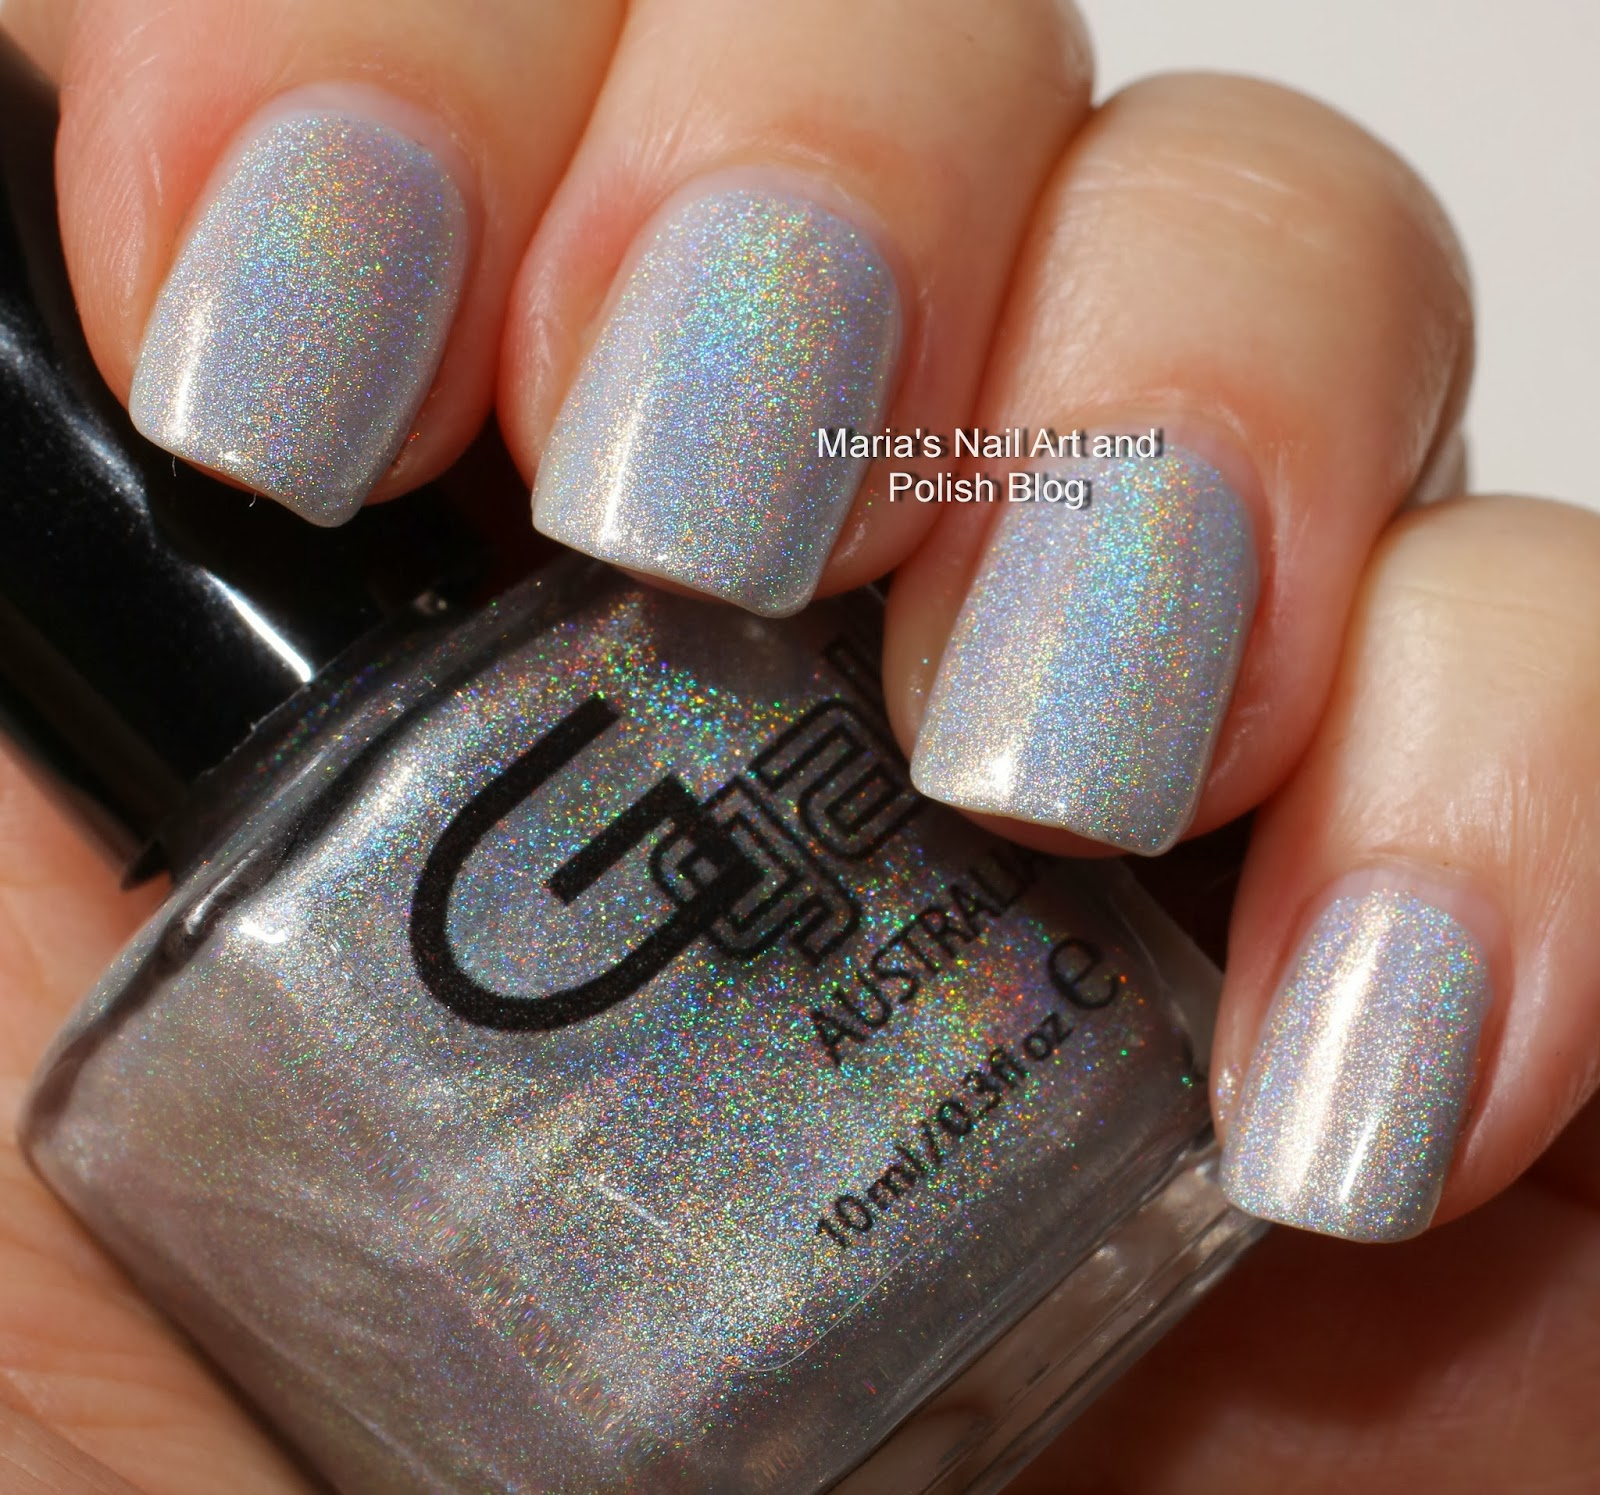 Marias Nail Art and Polish Blog: Glitter Gal holo swatches ...